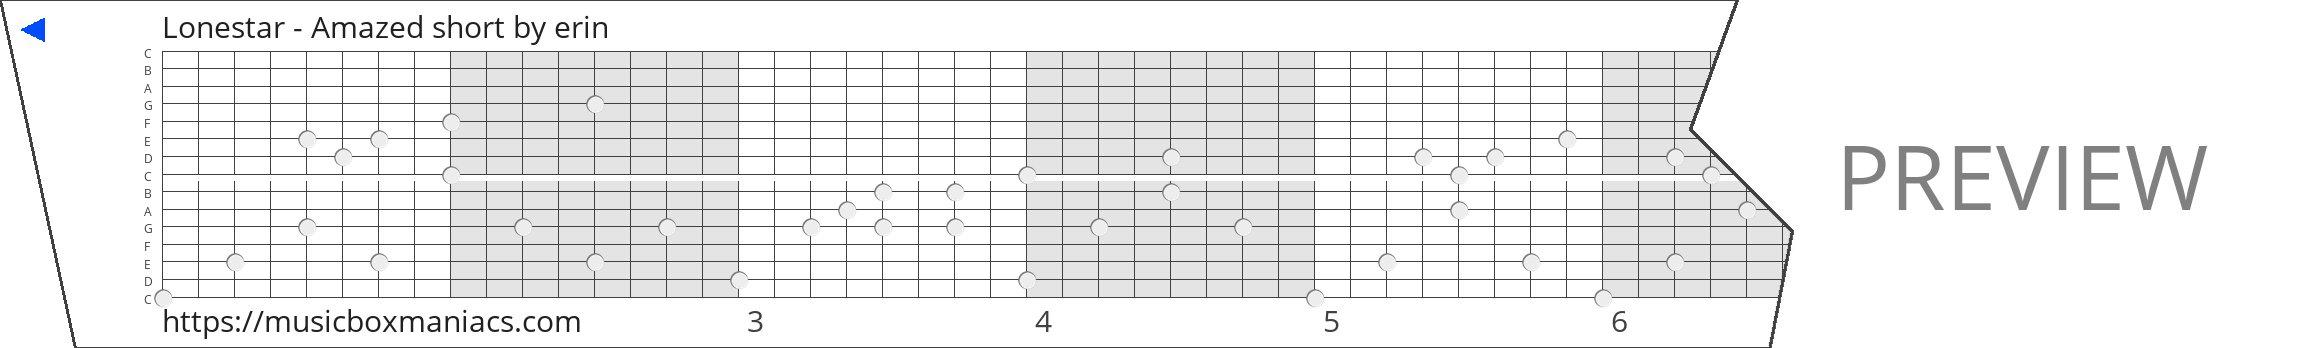 Lonestar - Amazed short 15 note music box paper strip